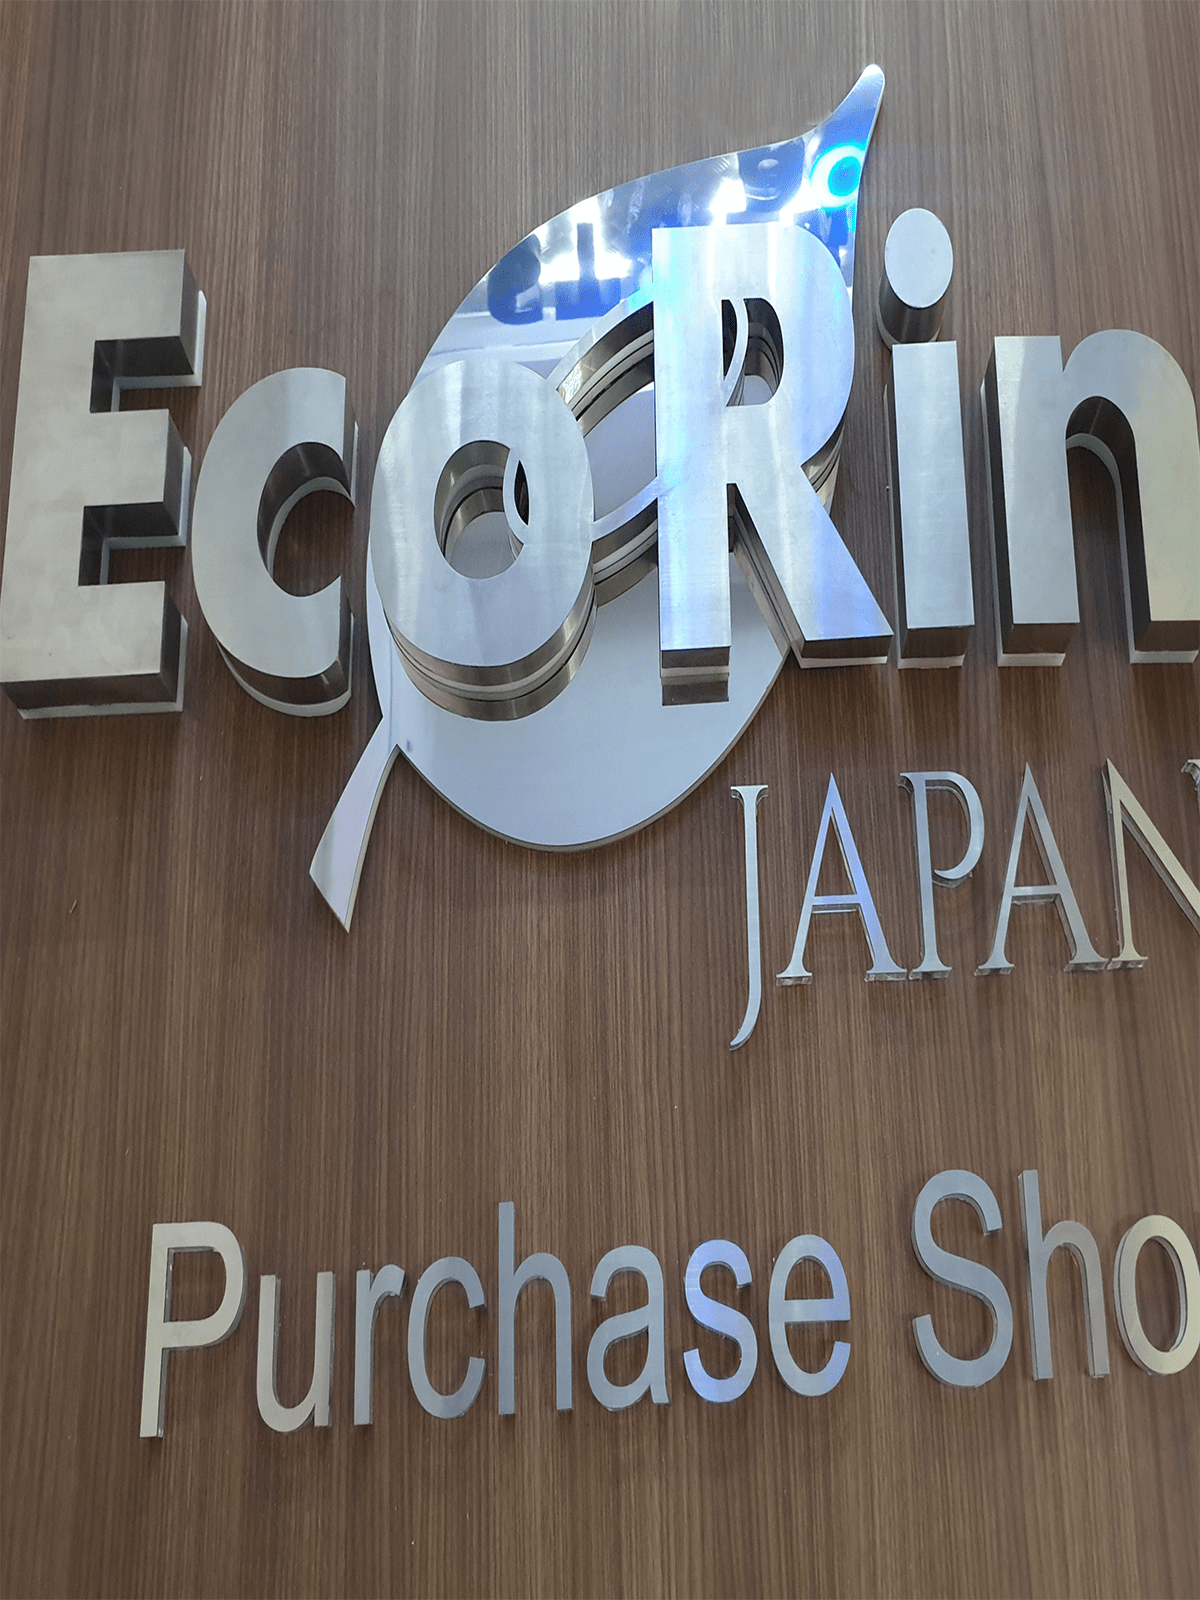 eco ring japan